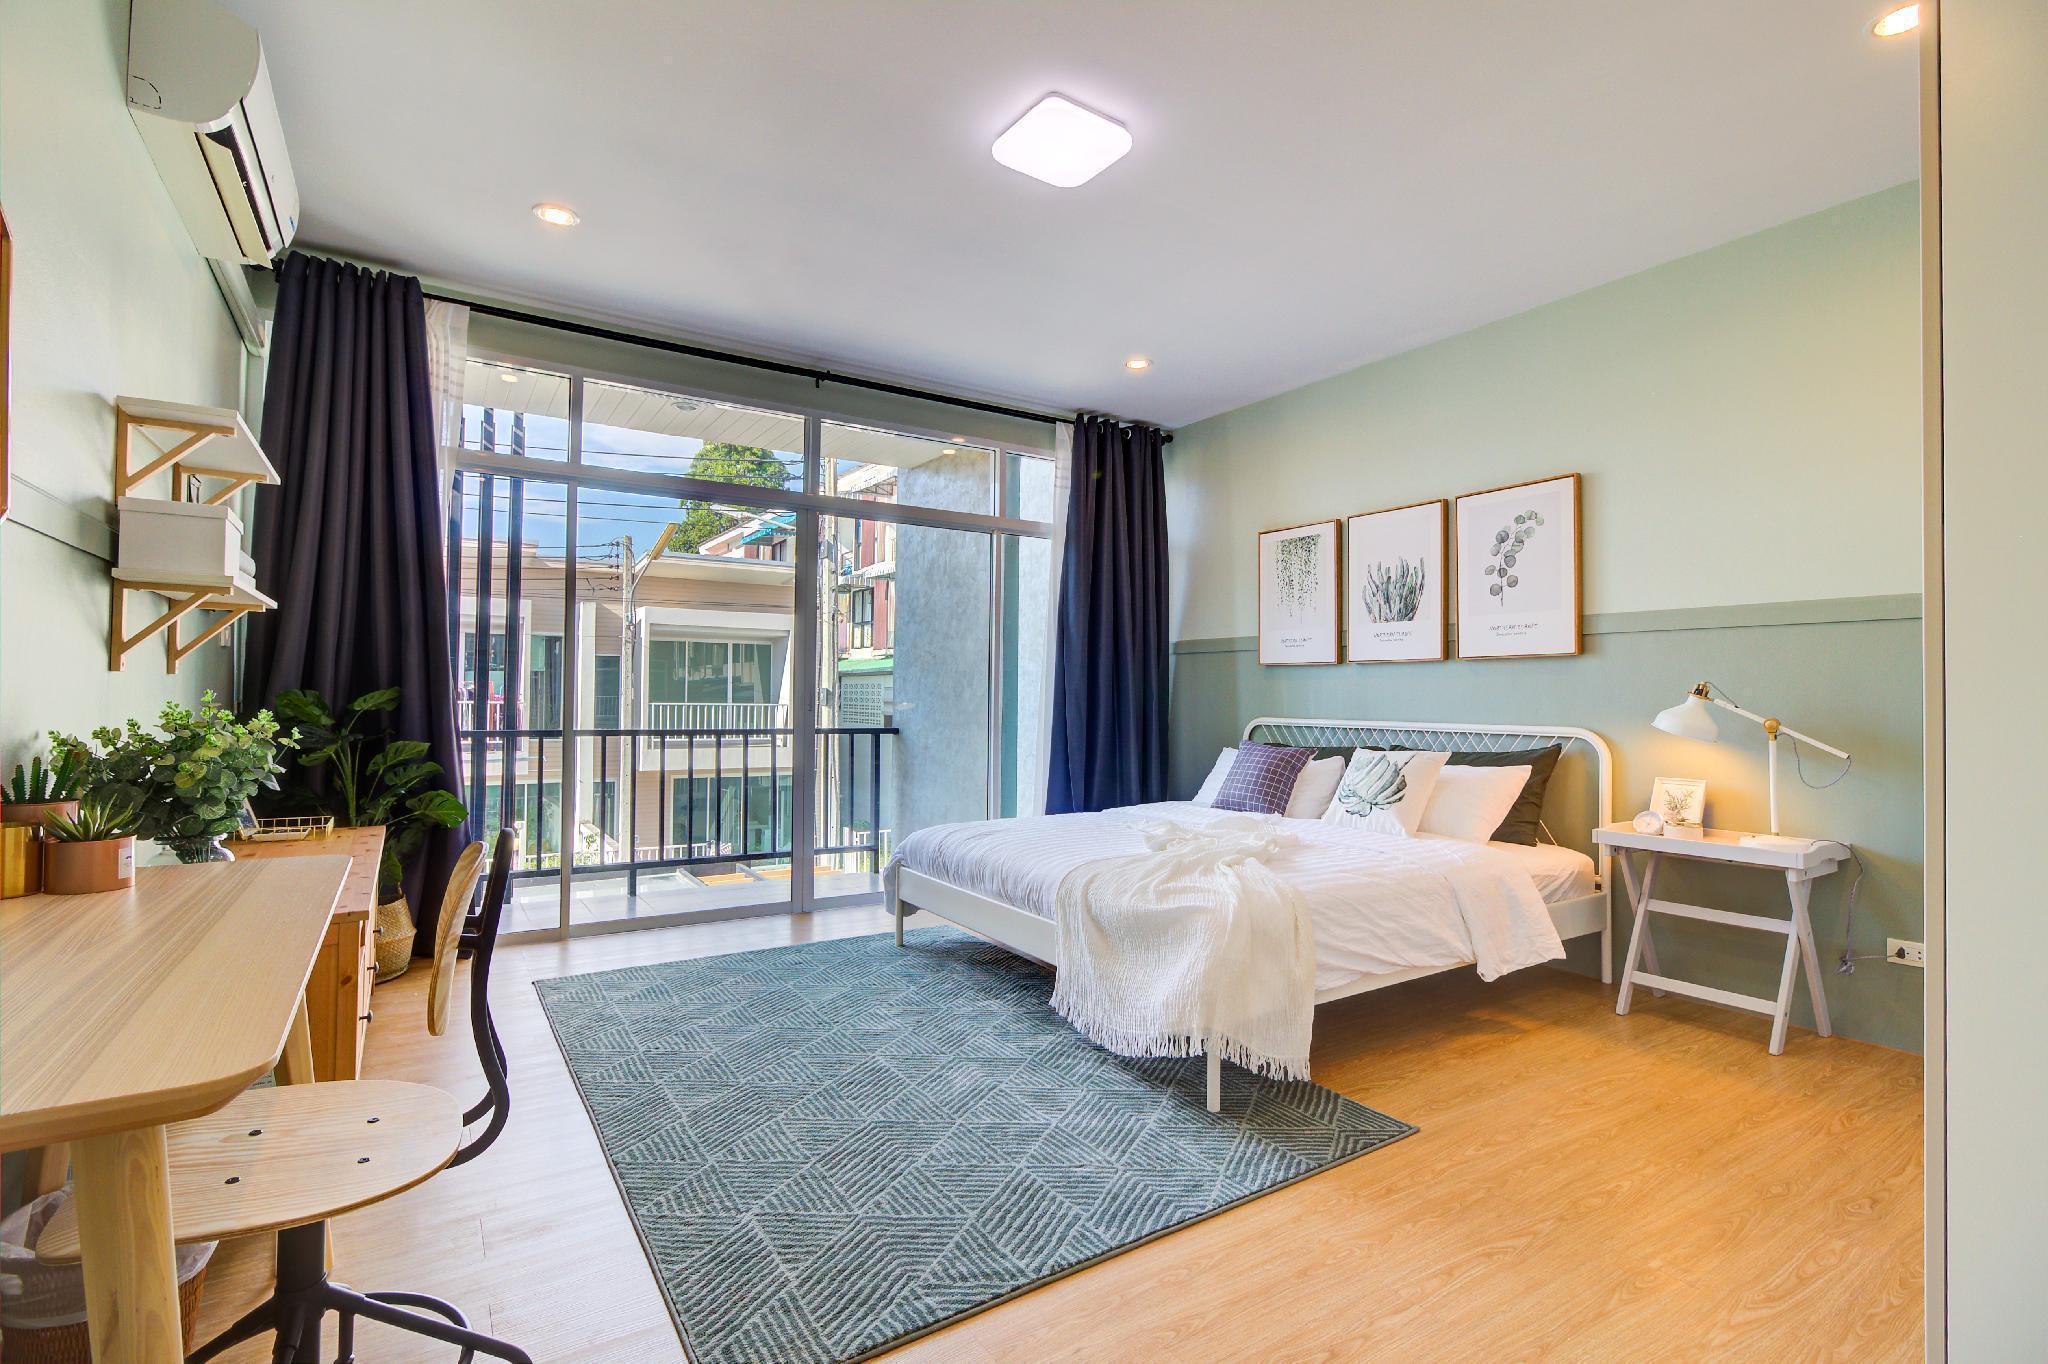 New Designer Home near Beach and Airport บ้านเดี่ยว 2 ห้องนอน 2 ห้องน้ำส่วนตัว ขนาด 100 ตร.ม. – สนามบินภูเก็ต